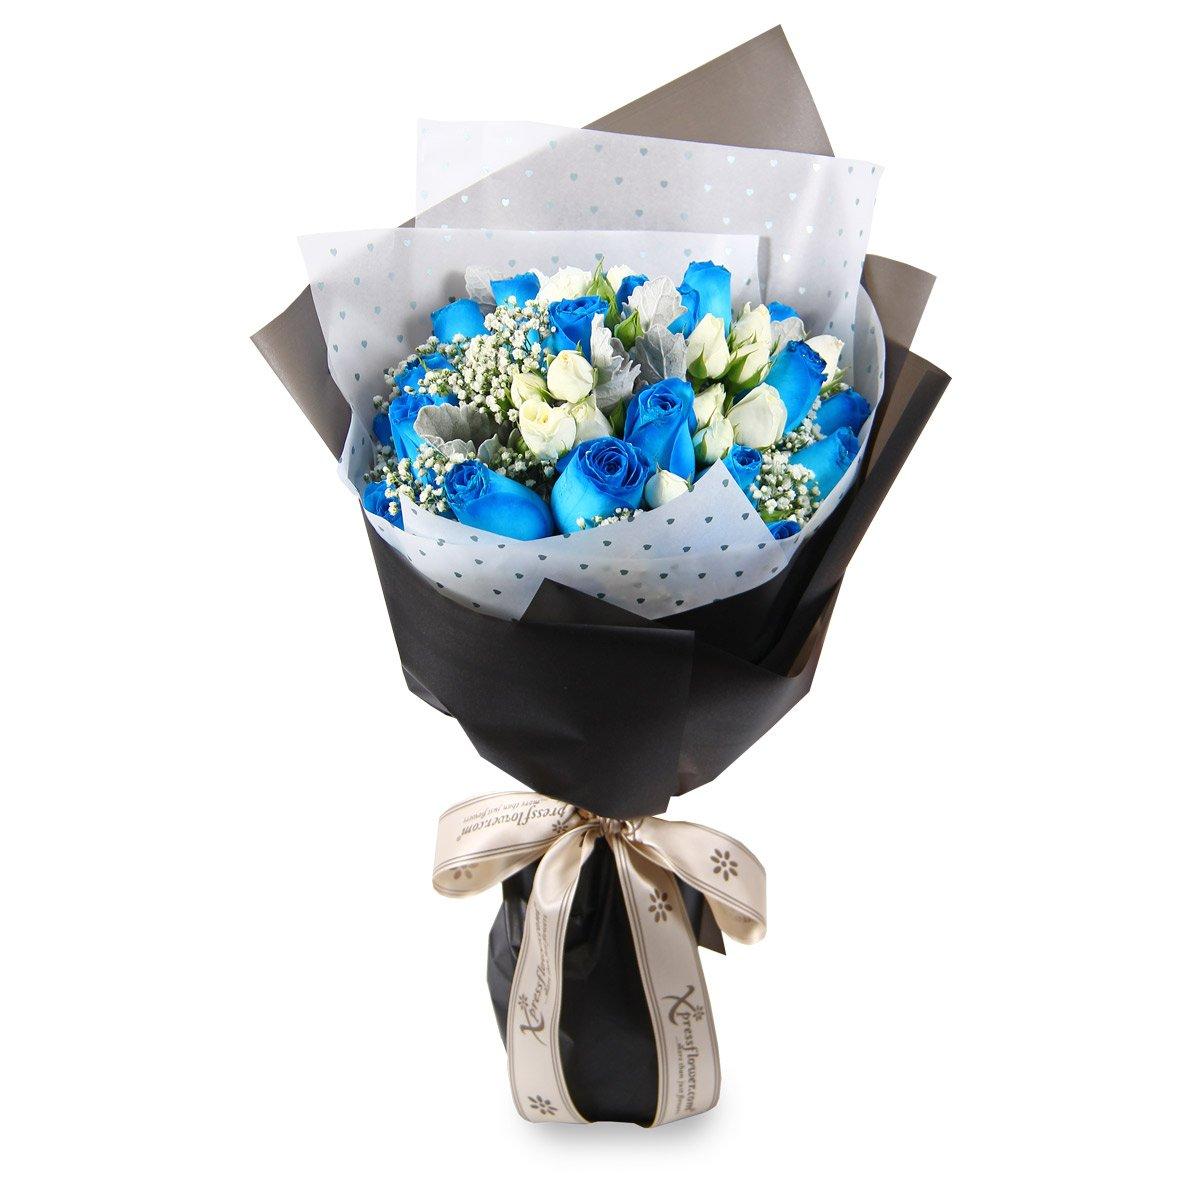 Flower Bouquet Hand Bouquet Delivery Simply Bouquet By Xpressflower